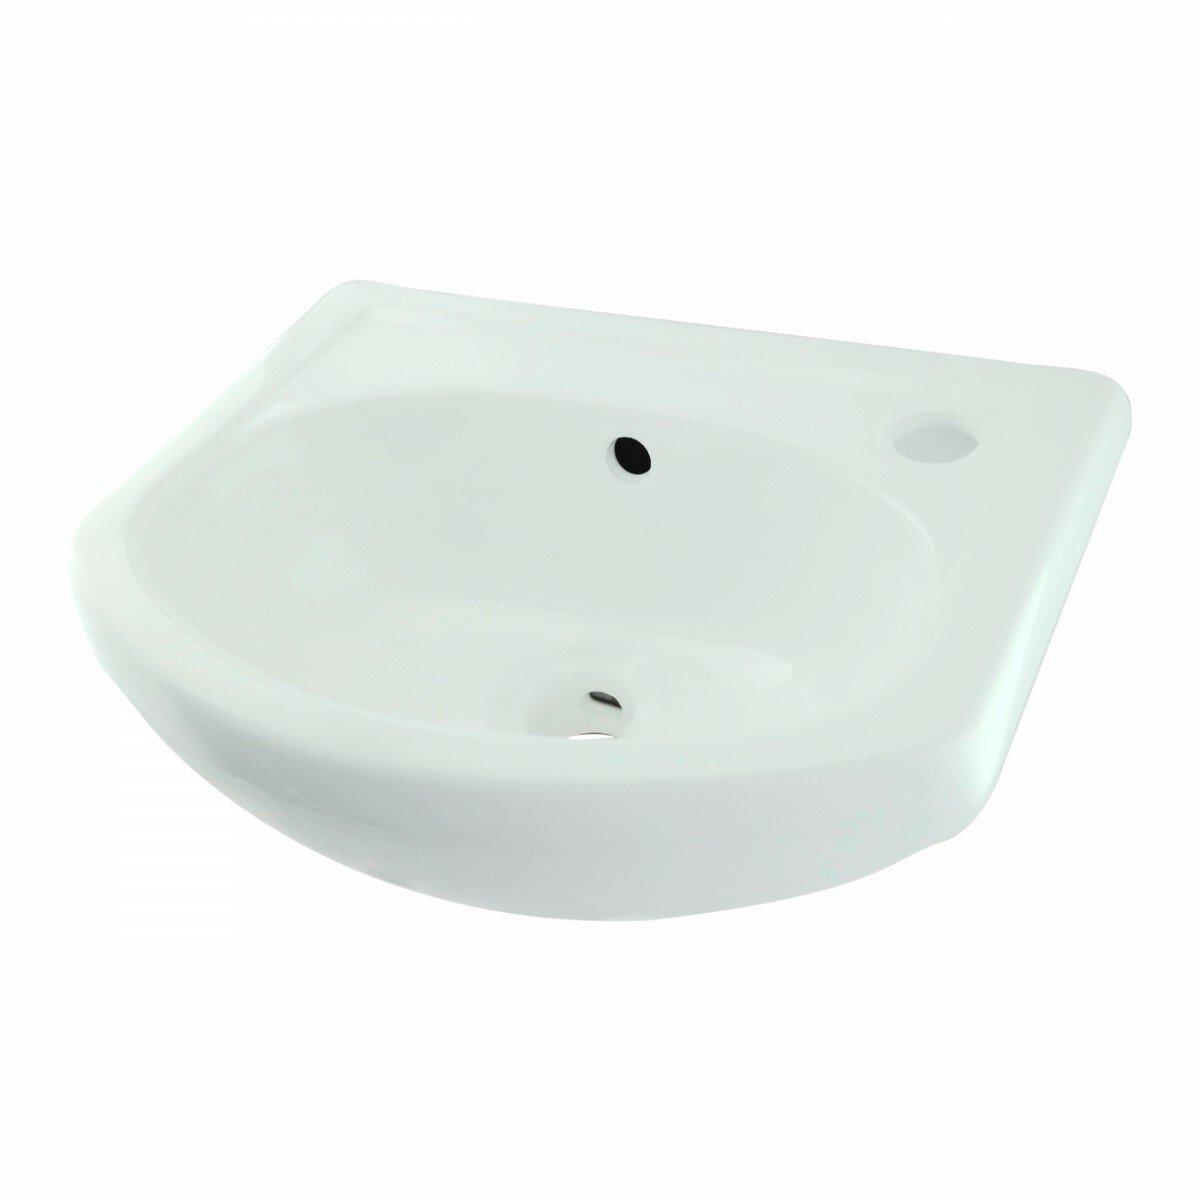 The Renovators Supply Inc Small Space Saving Vitreous China 16 Wall Mount Bathroom Sink With Overflow Wayfair